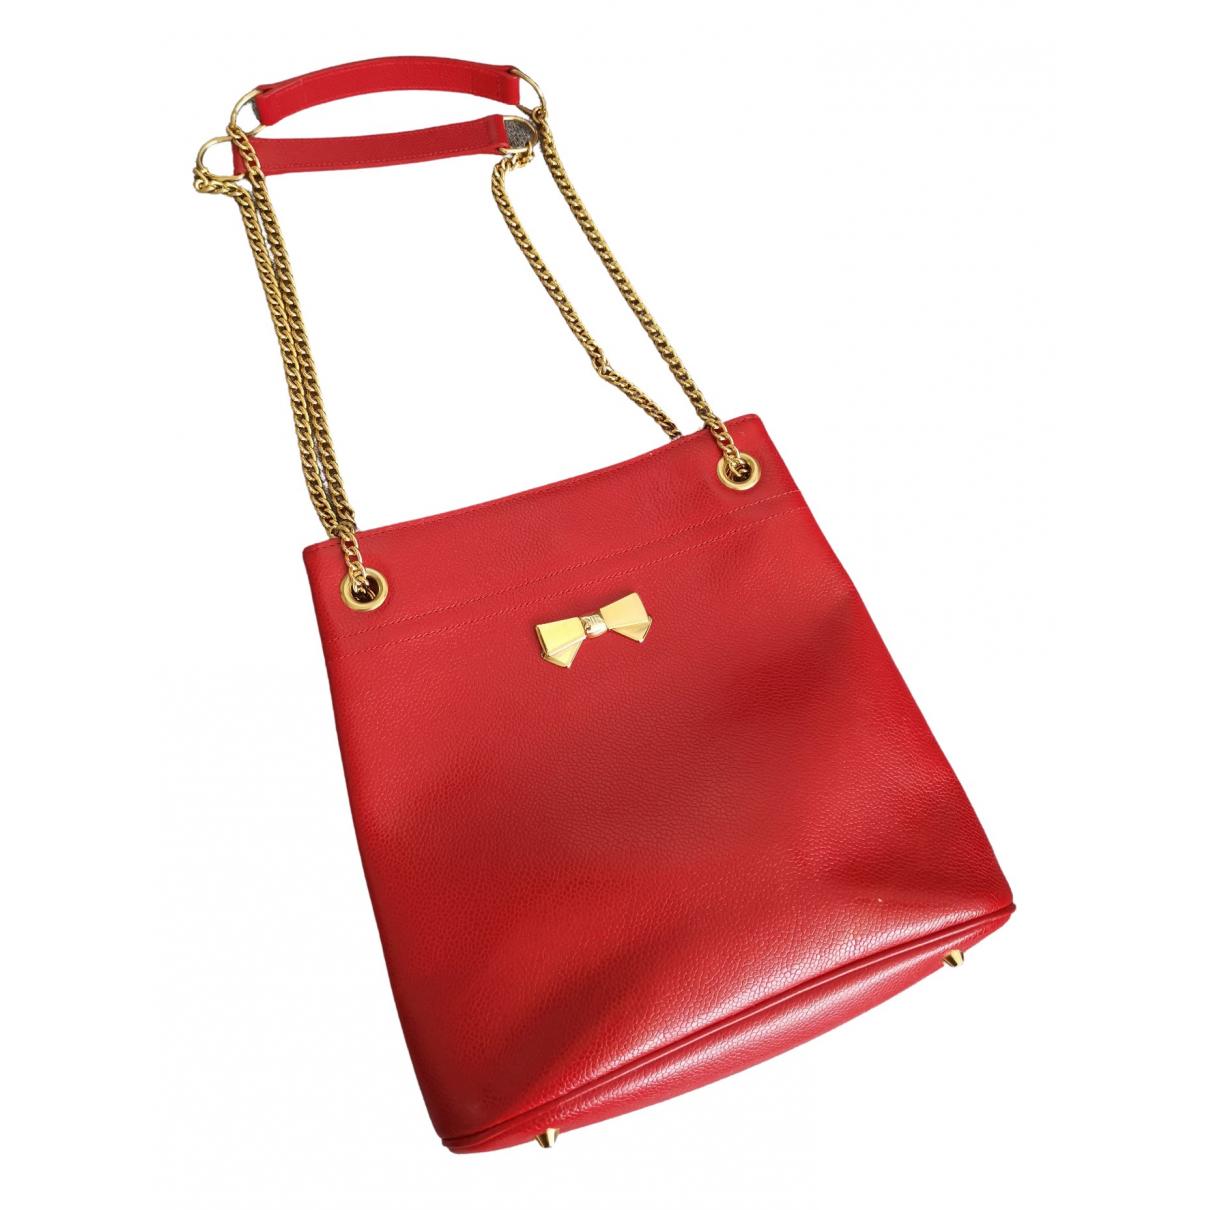 Nina Ricci - Sac a main   pour femme en cuir - rouge